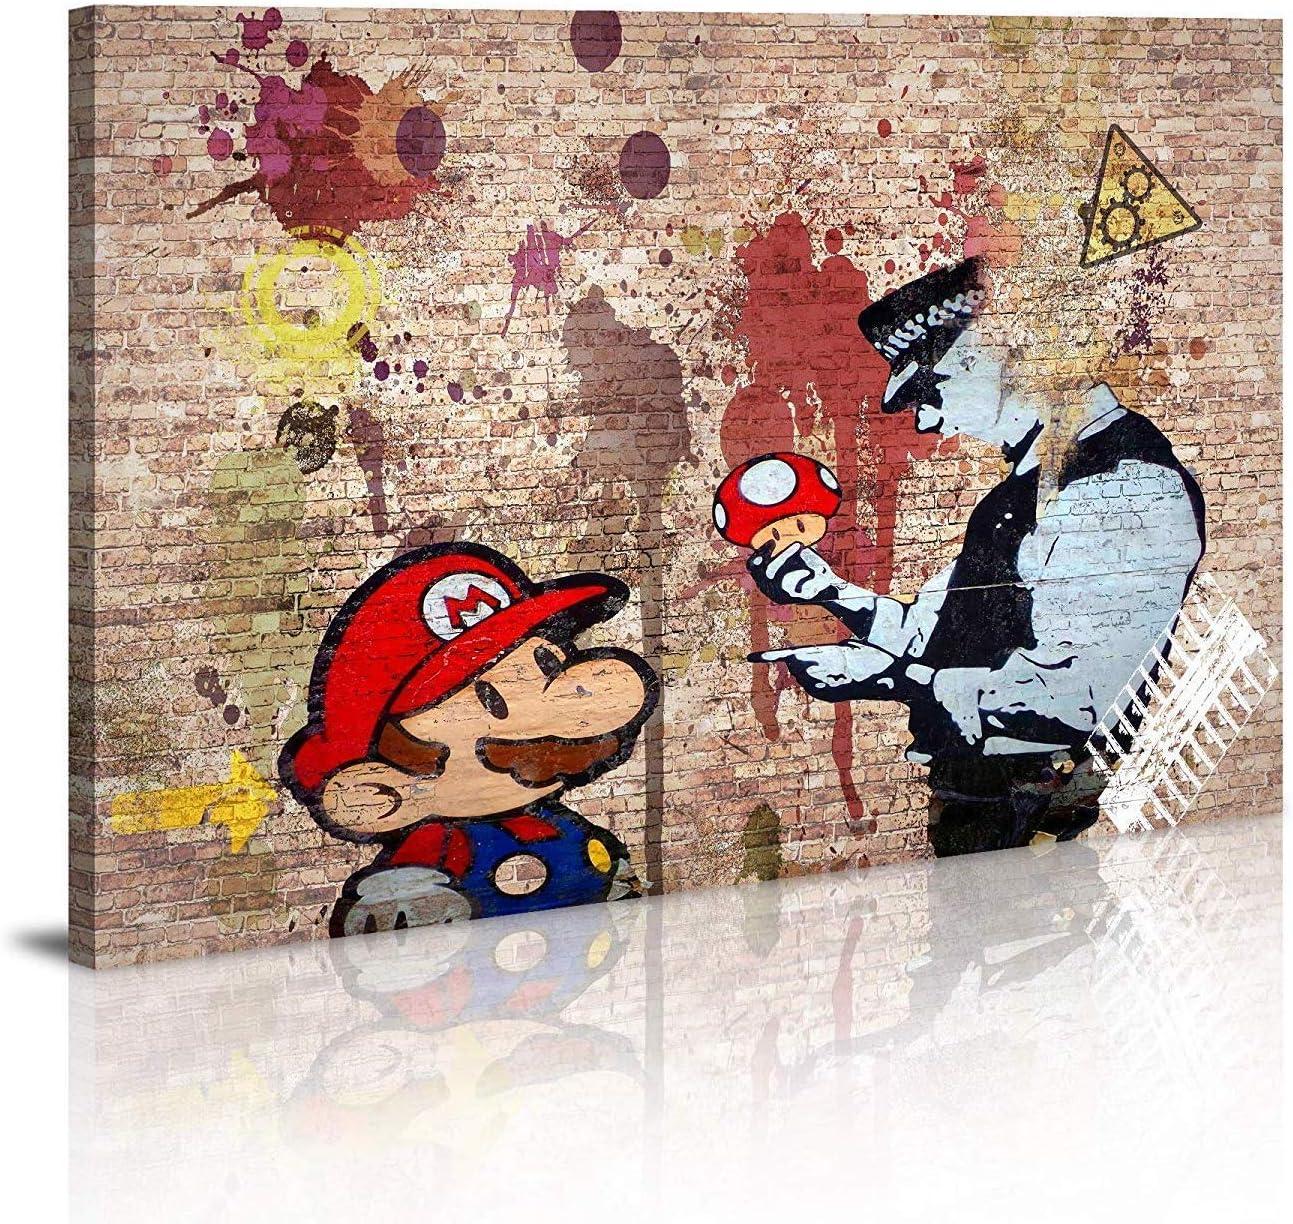 Canvas Prints Framed Wall Art Banksy Art Wall Art for Bedroom Artwork Colorful Figure Street Graffiti 20x28Wall Decor Pics for Living Room Decor Ready to Hang